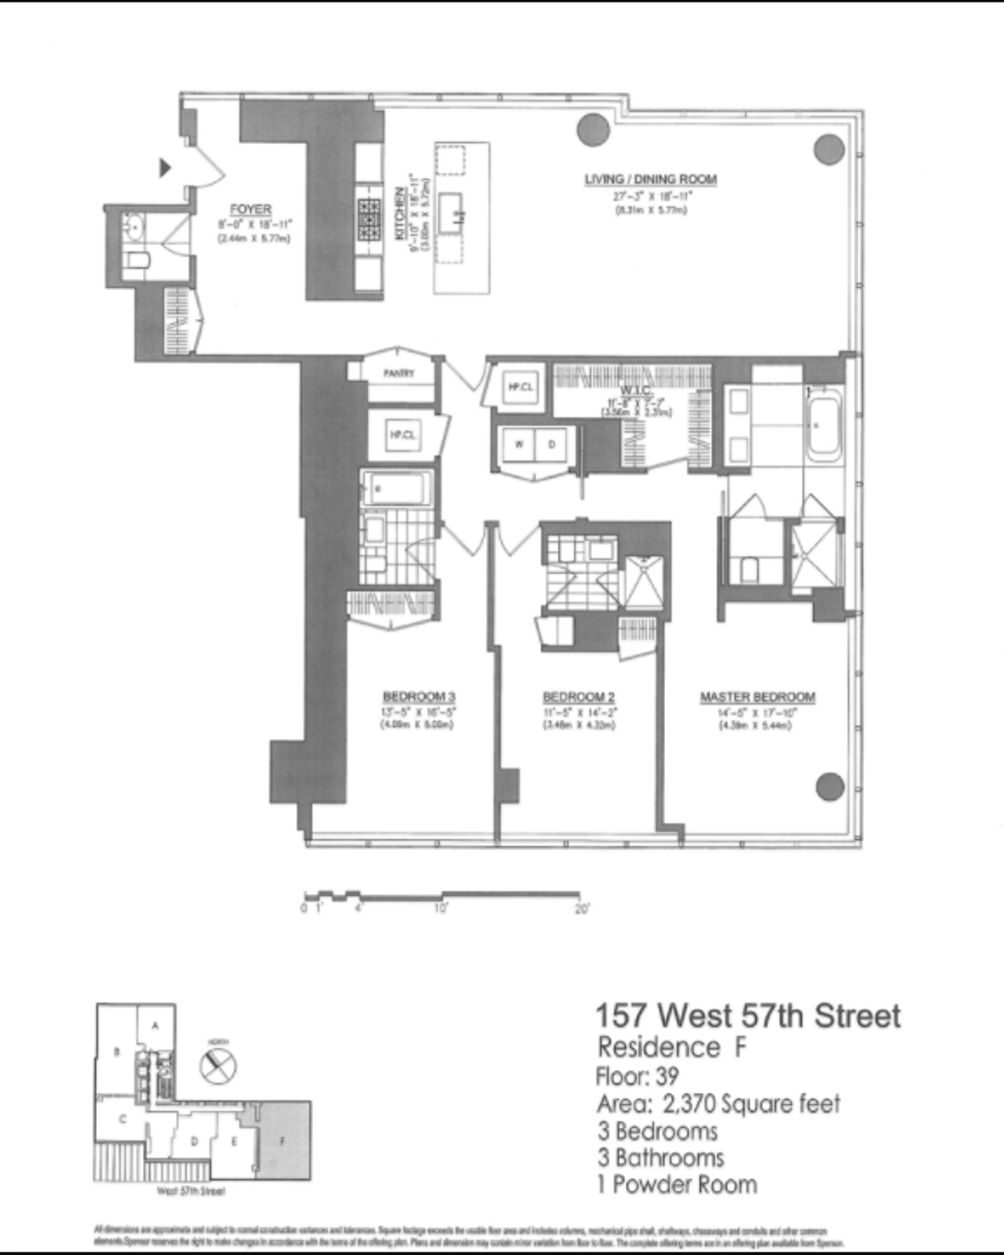 157 West 57th Street #39F floor plan